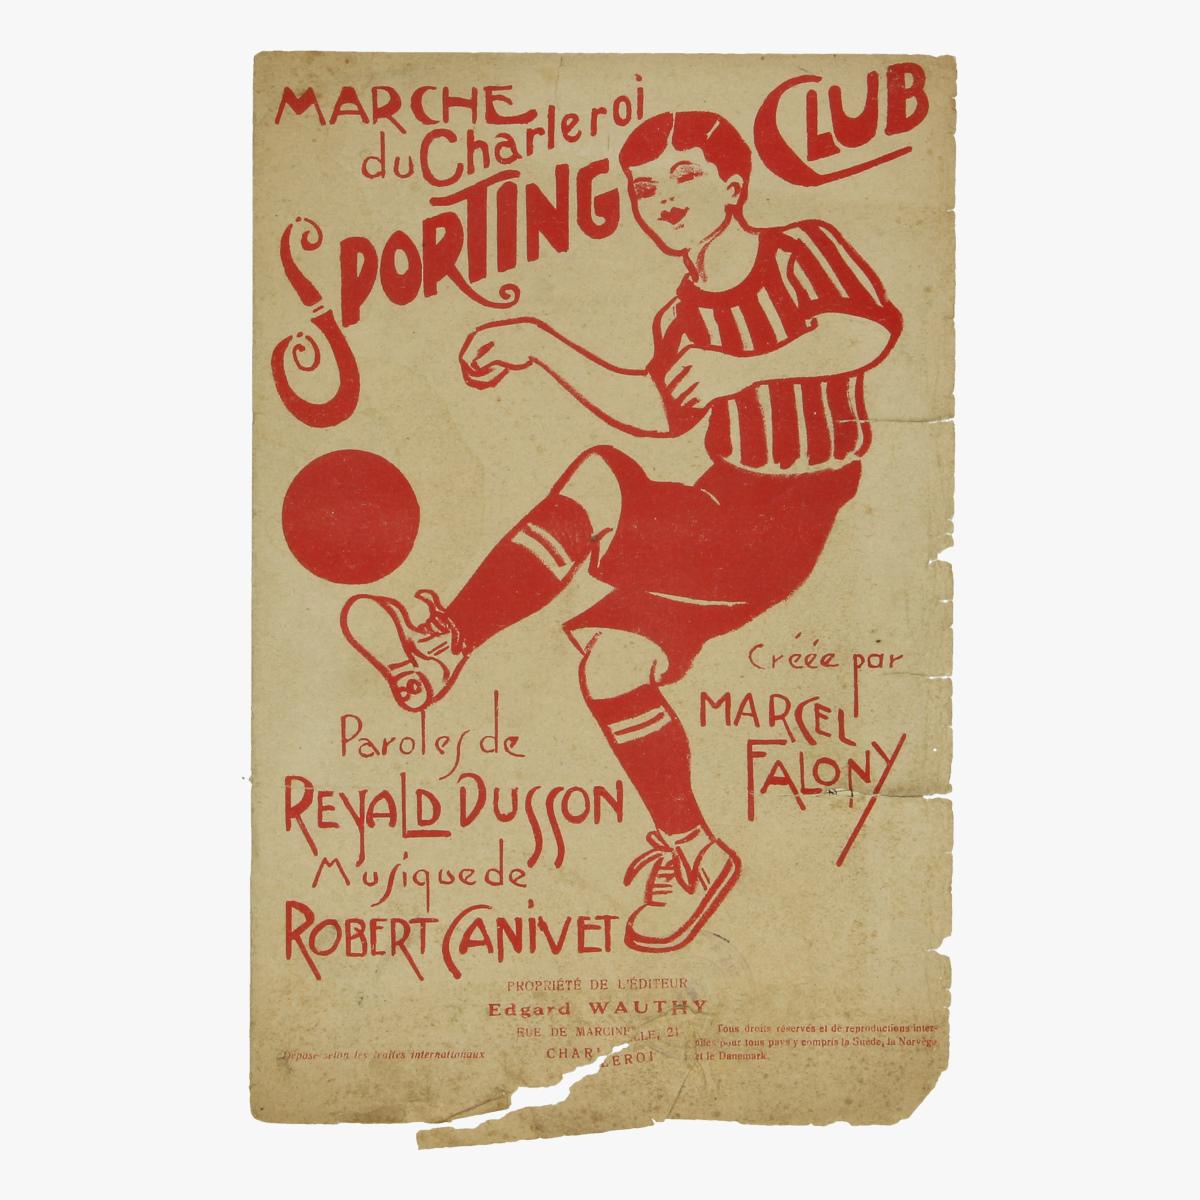 Afbeeldingen van voetbal marche du charleroi sporting club